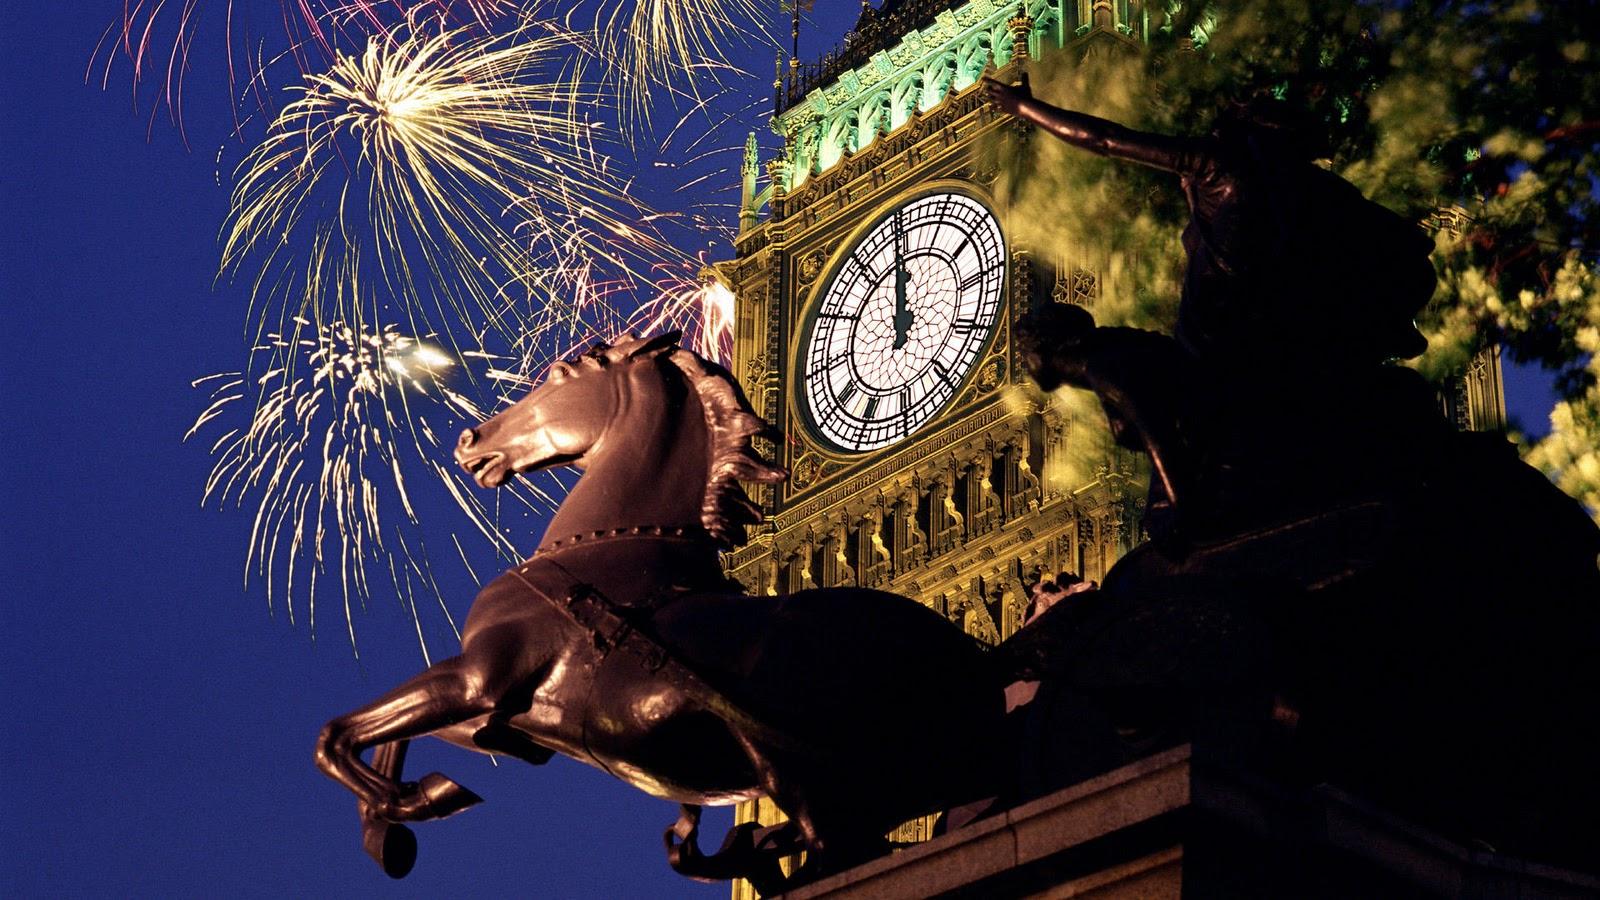 midnight-fireworks-london4